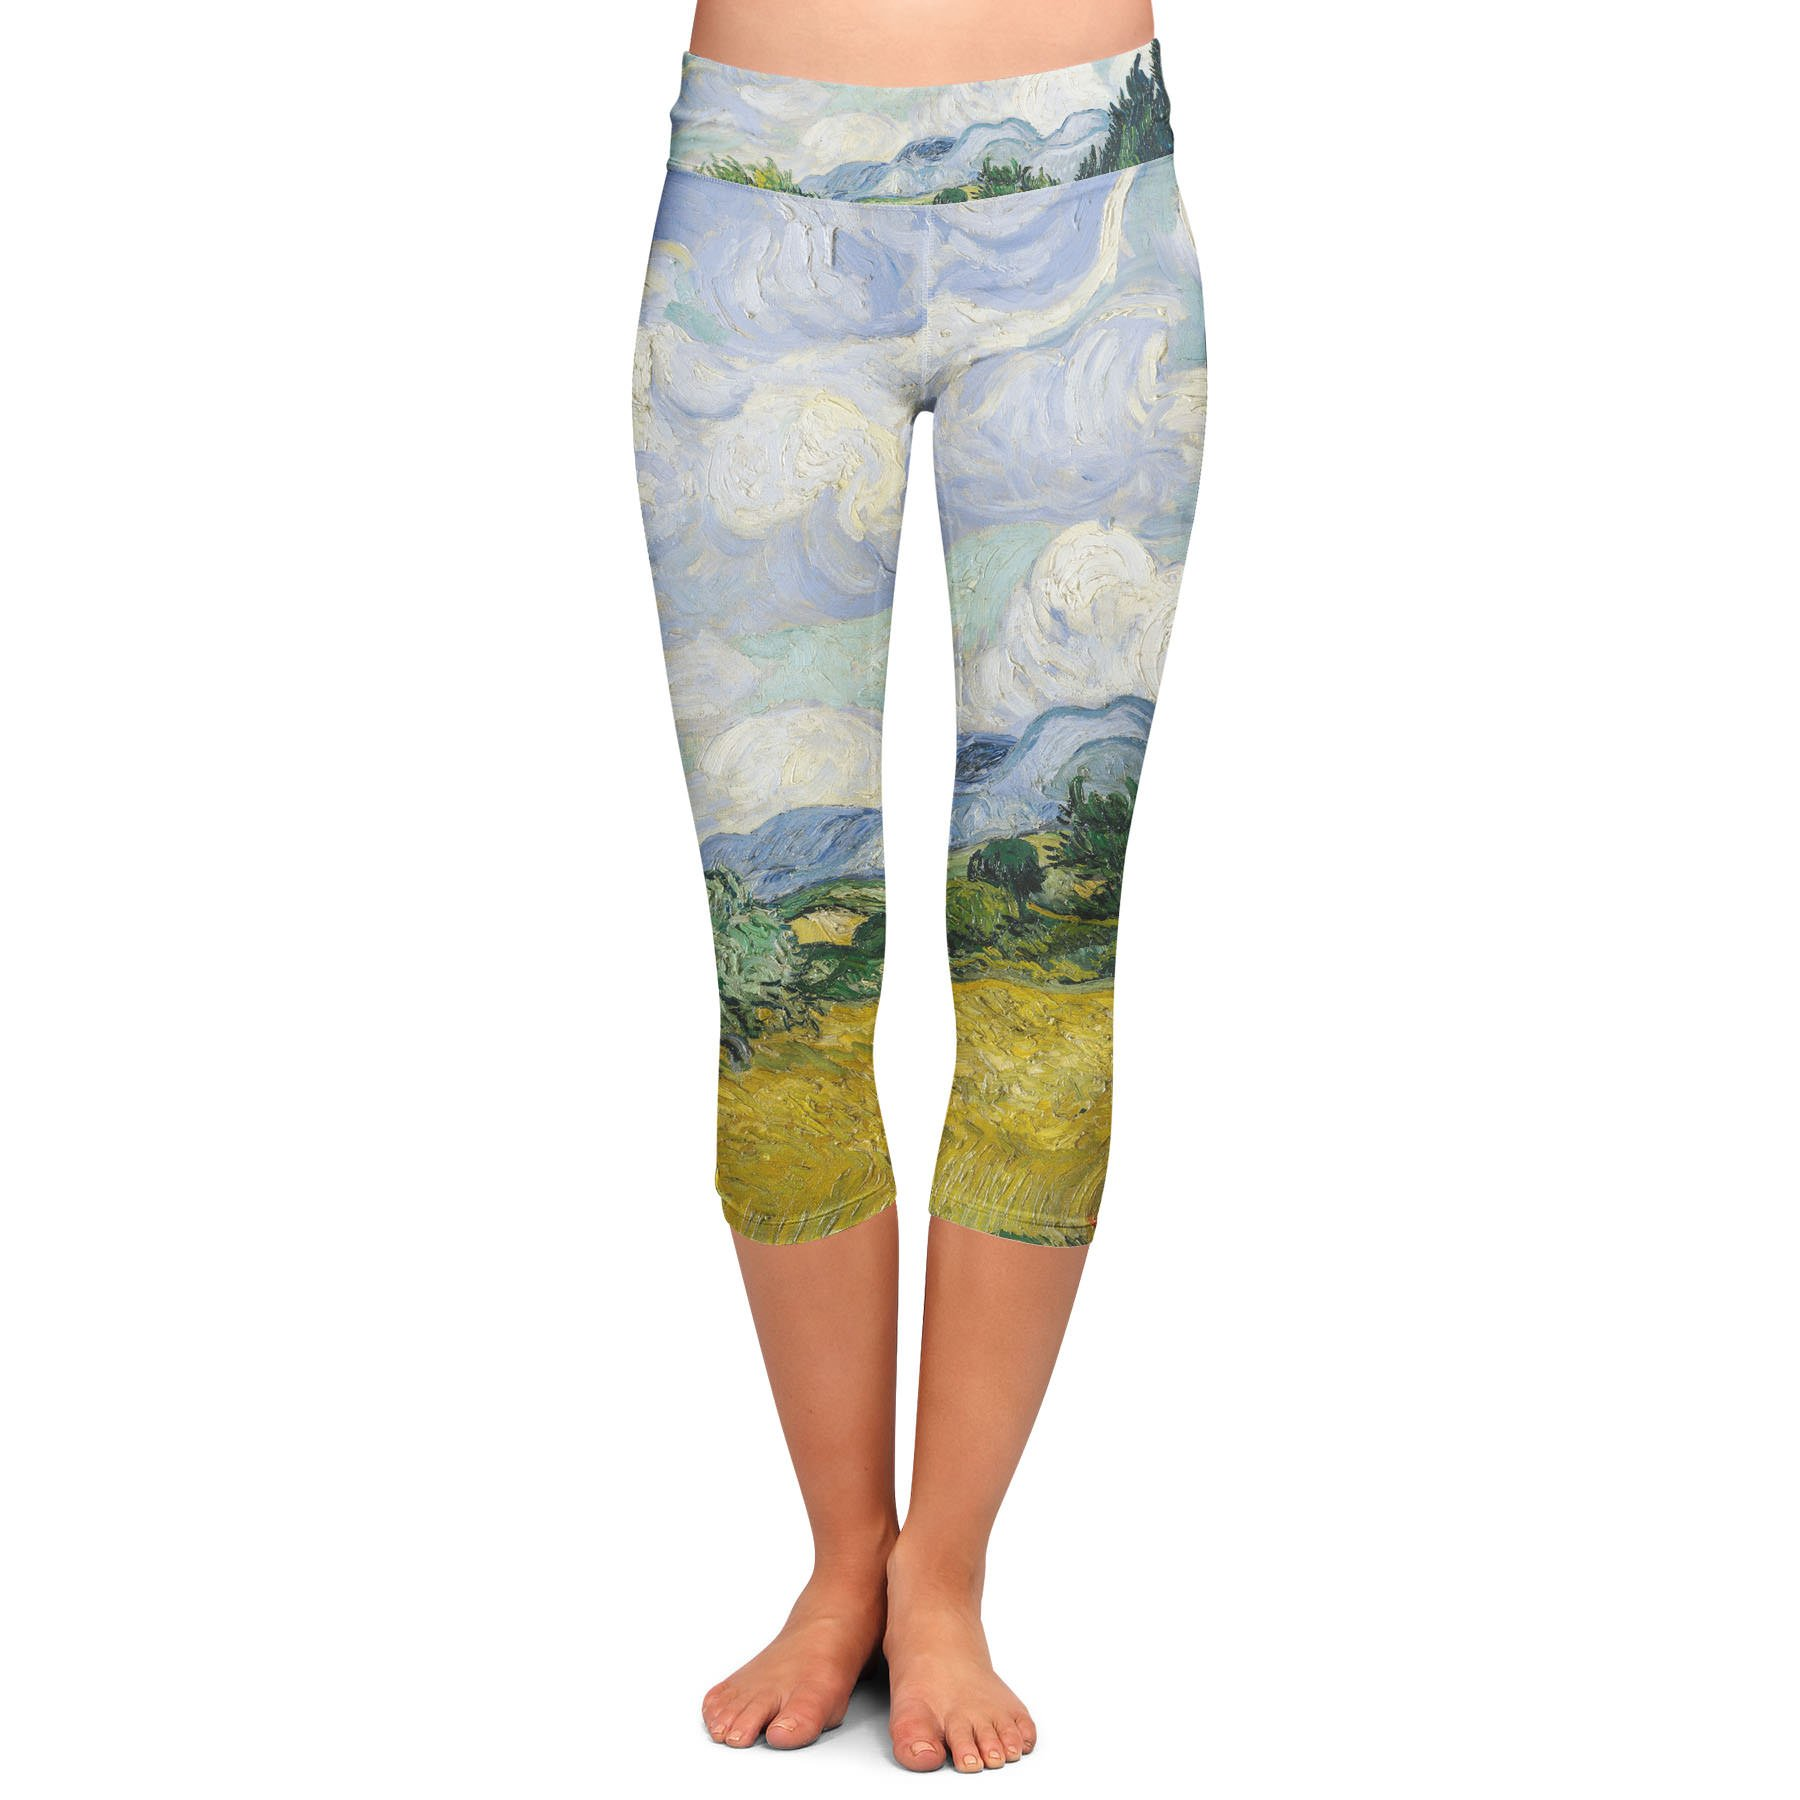 Vincent Van Gogh Fine Art Painting Yoga Leggings - Capri 3/4 Length, Low Waist